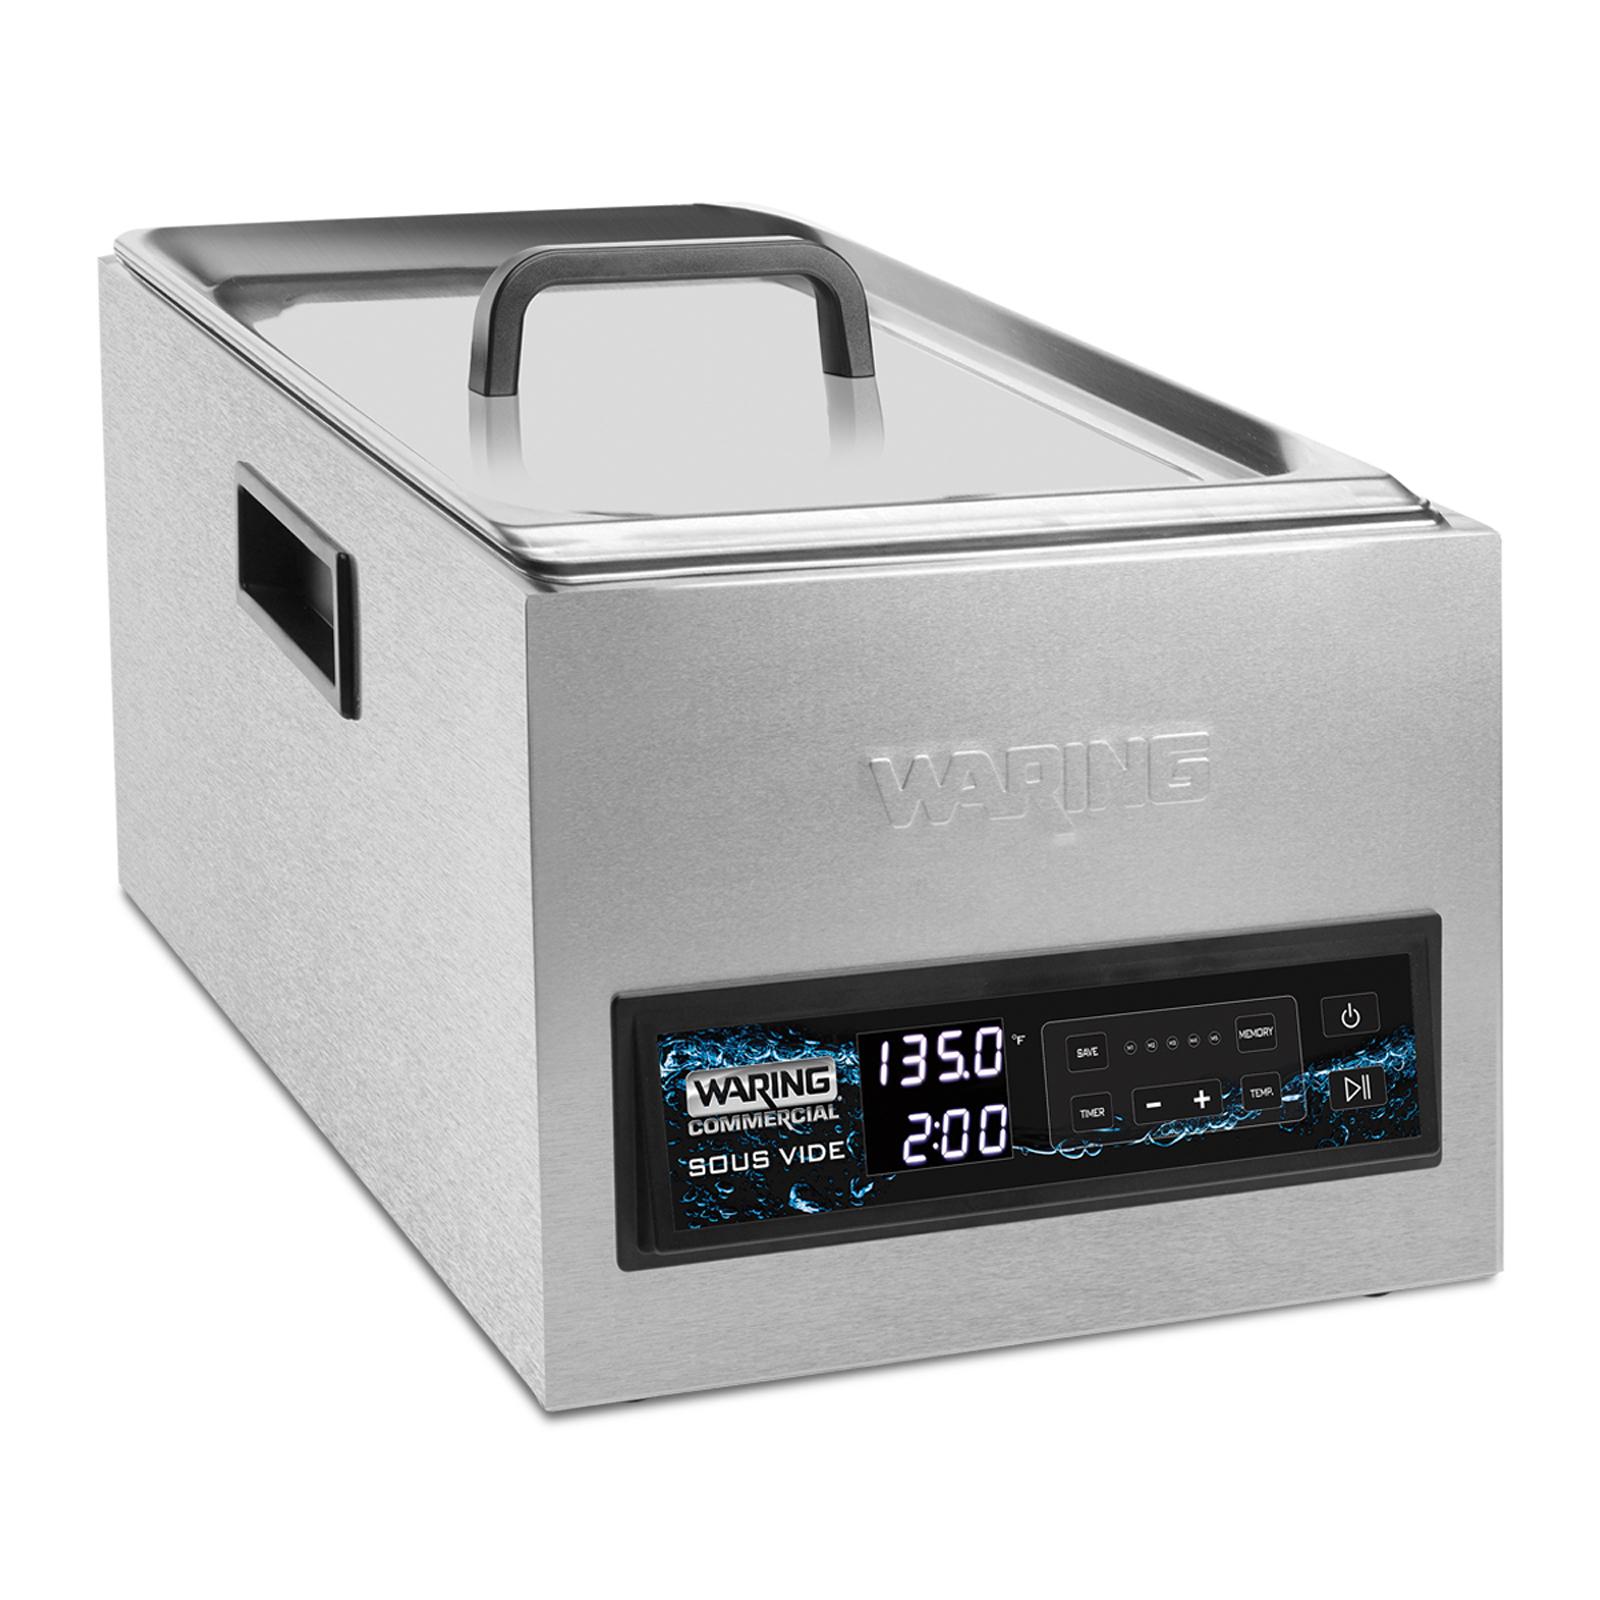 Waring WSV25 sous vide cooker